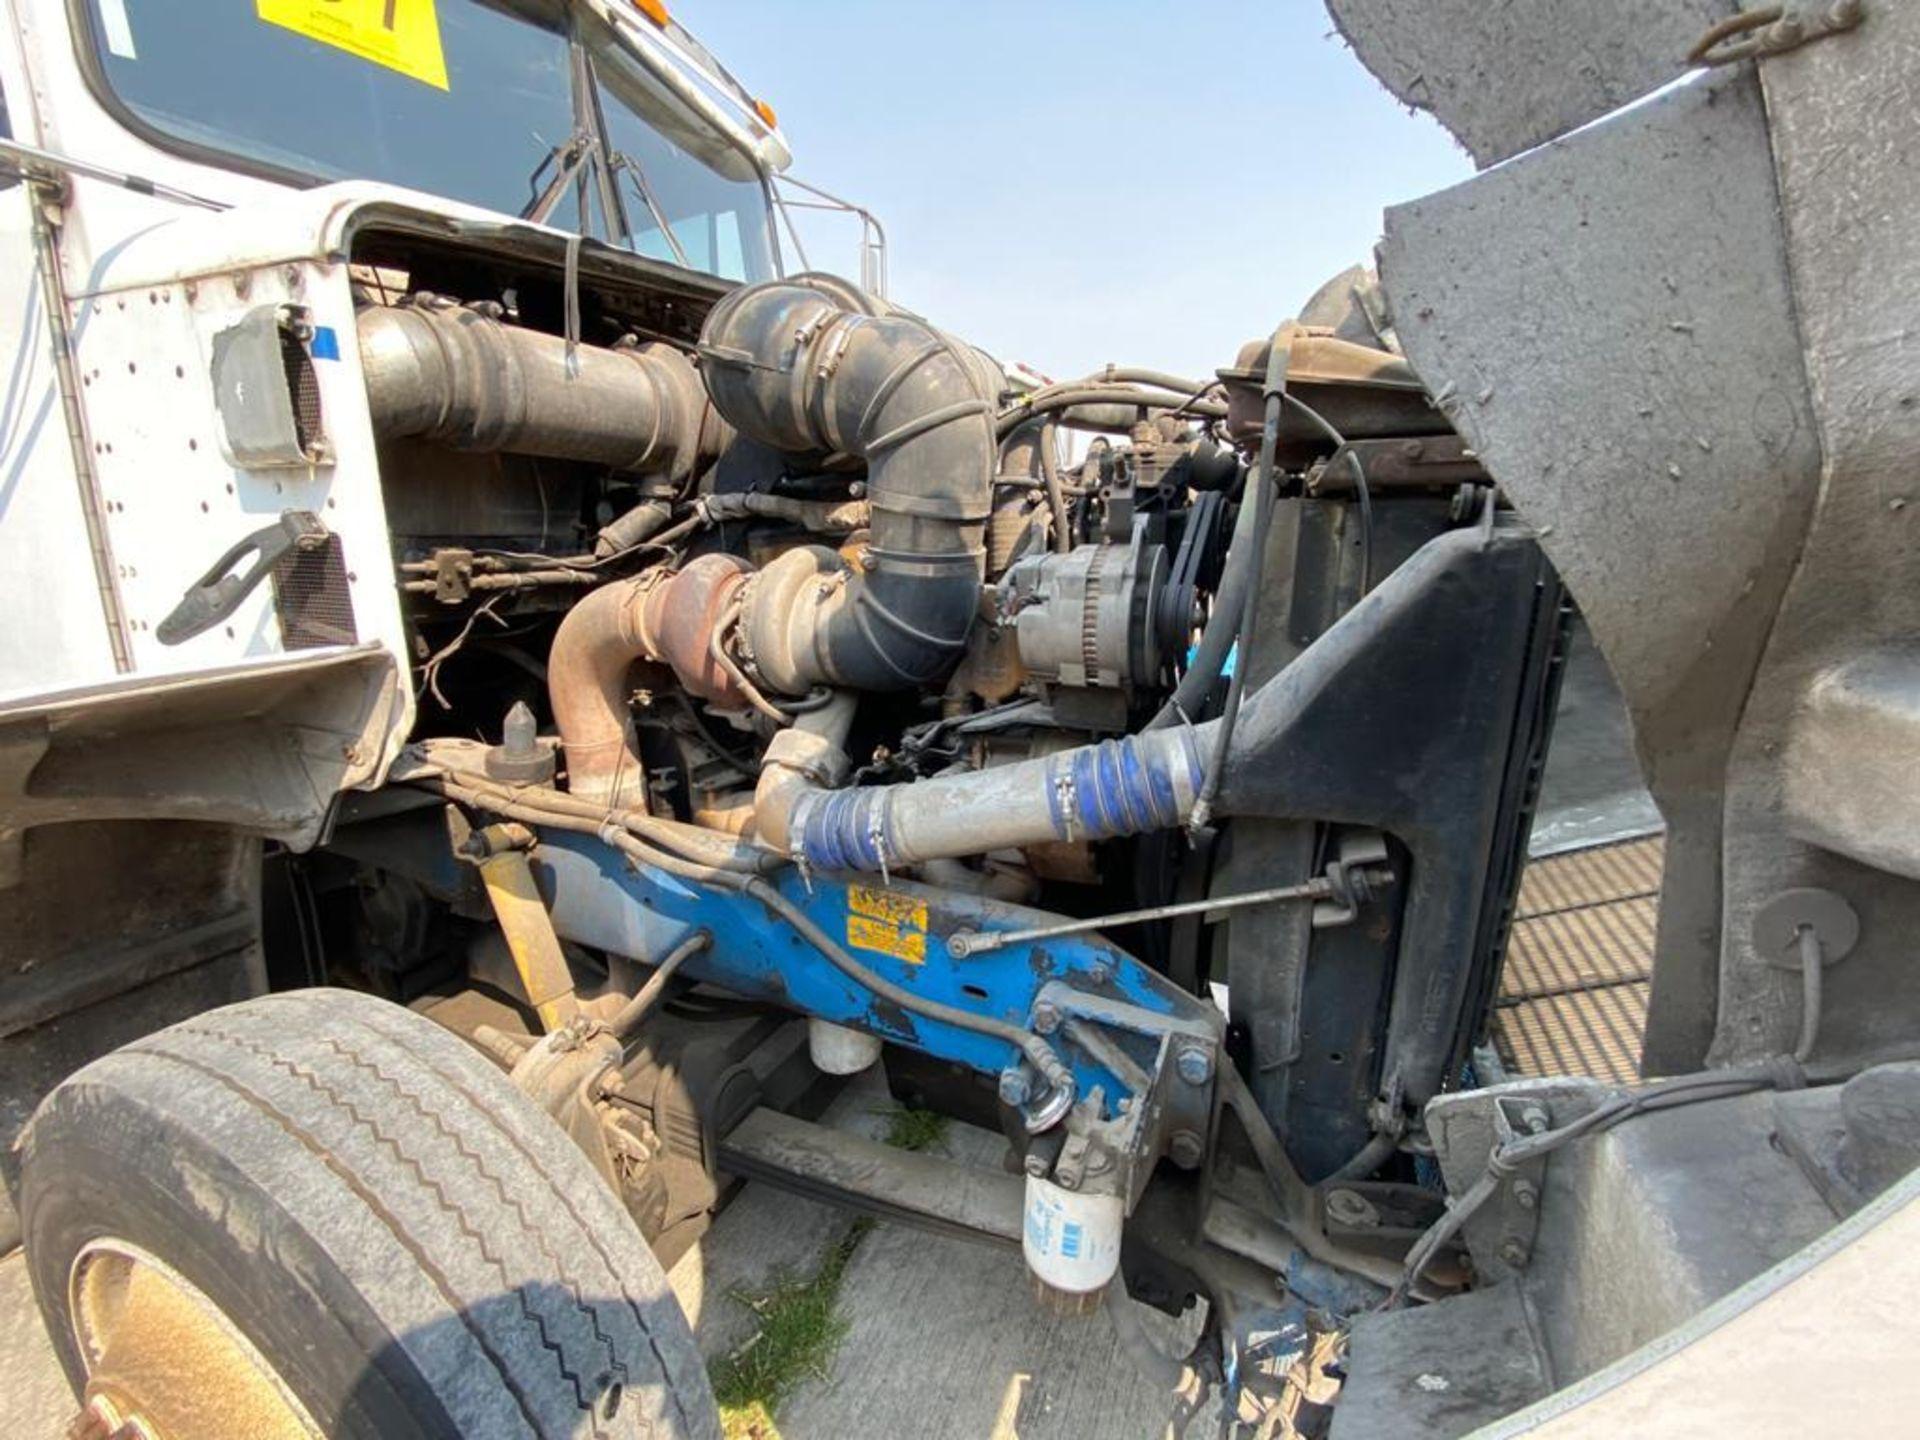 1999 Kenworth Sleeper truck tractor, standard transmission of 18 speeds - Image 62 of 72